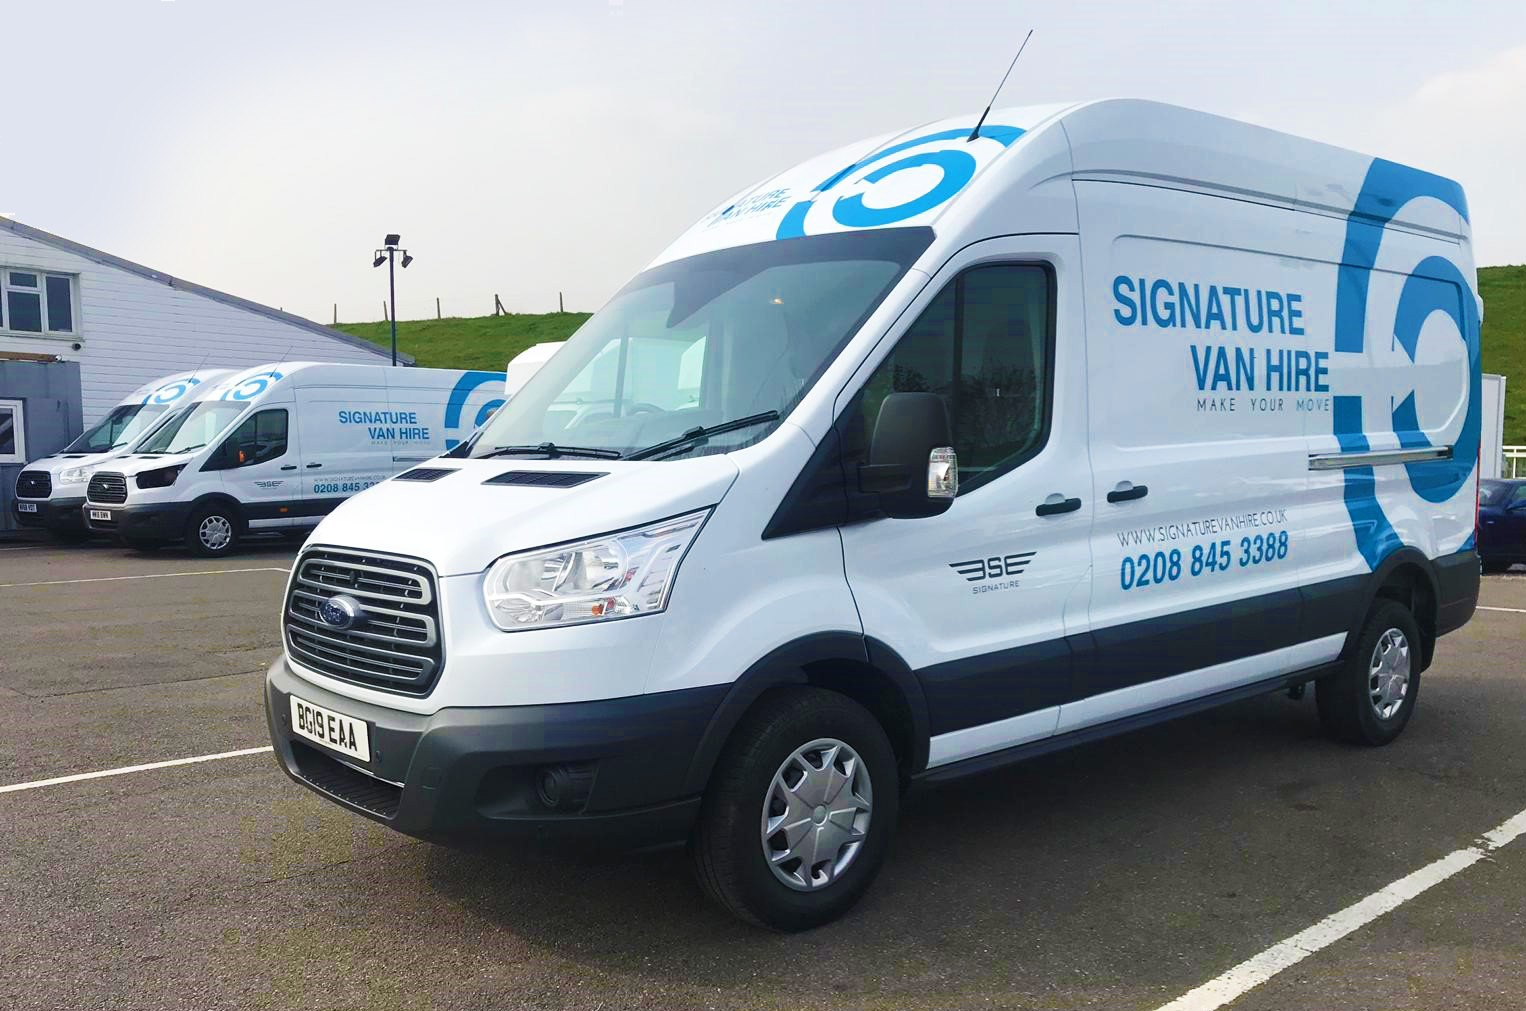 New Rental Vans get branded at Signature